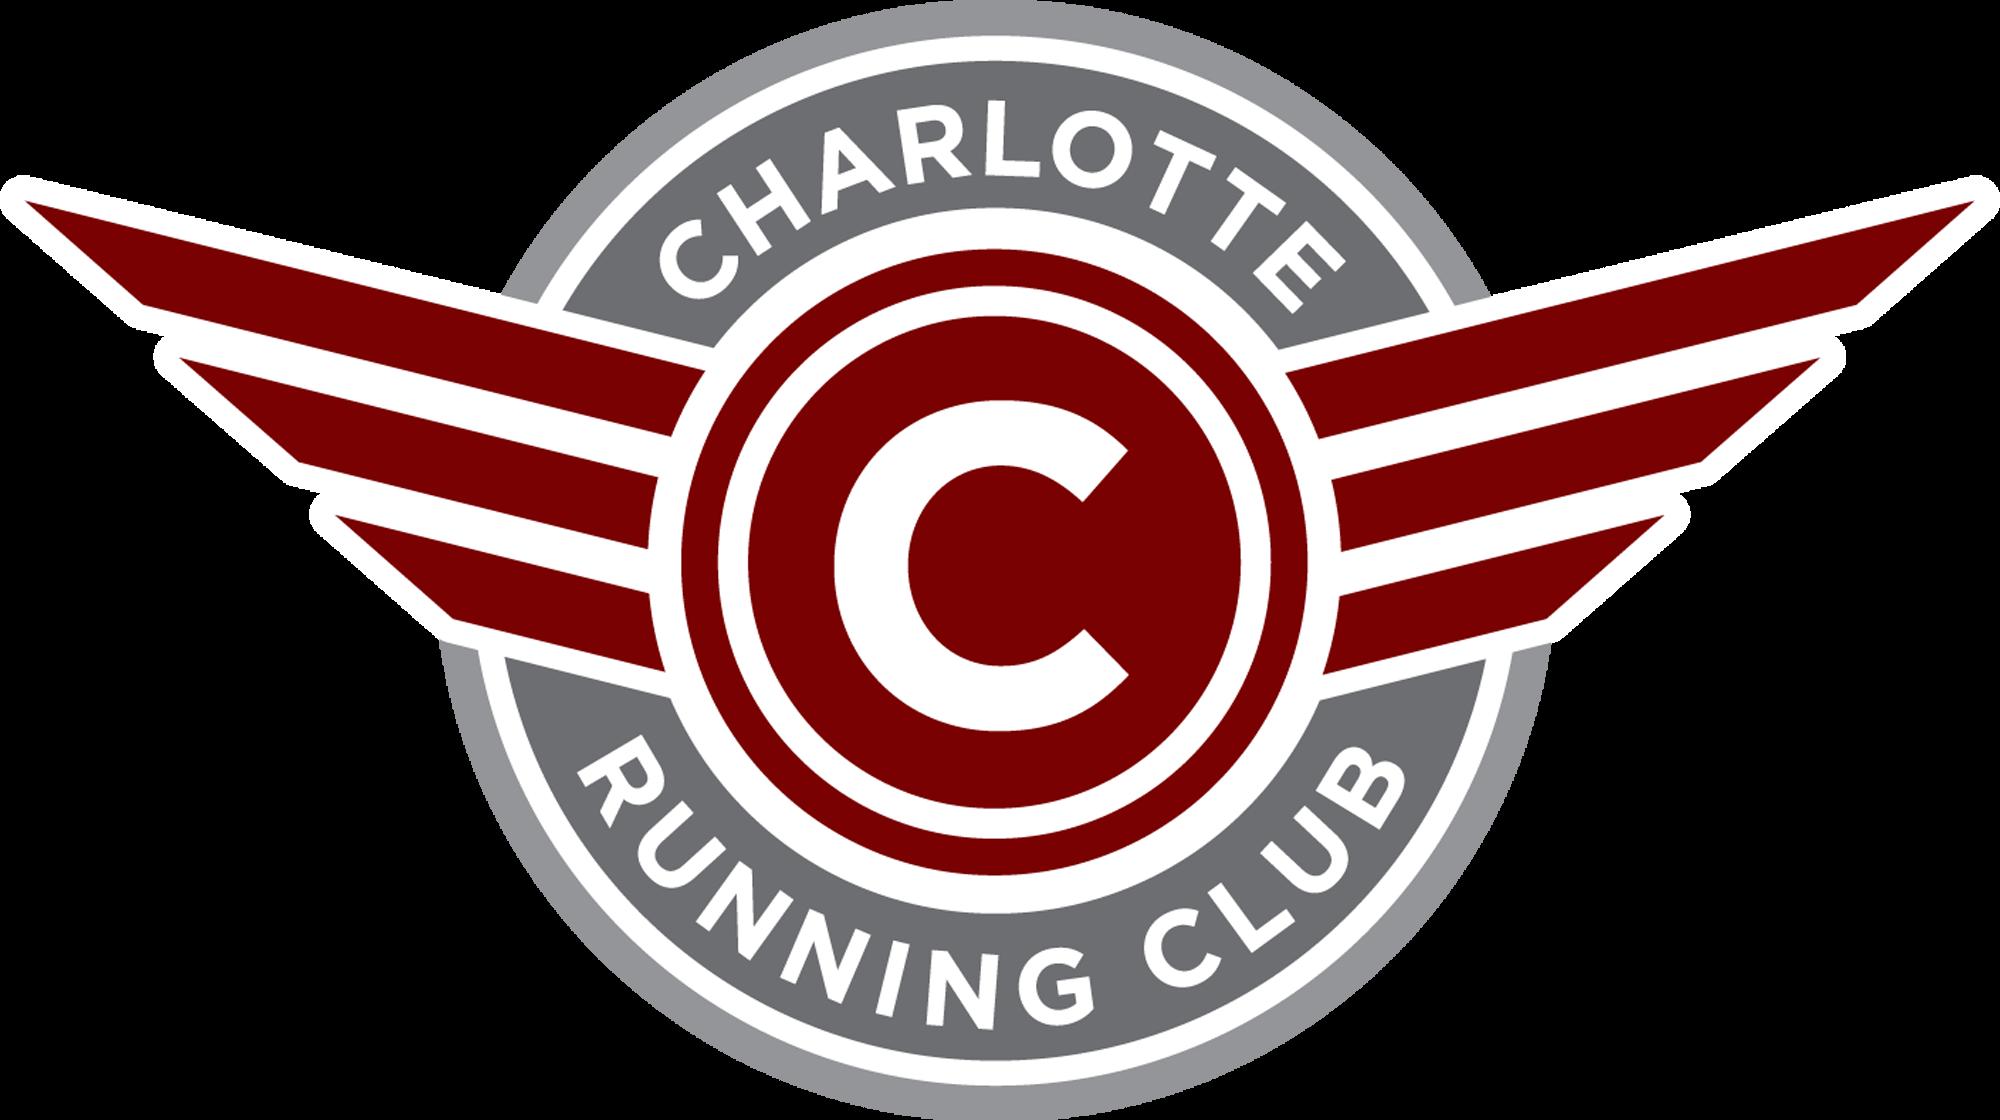 Charlotte Running Club